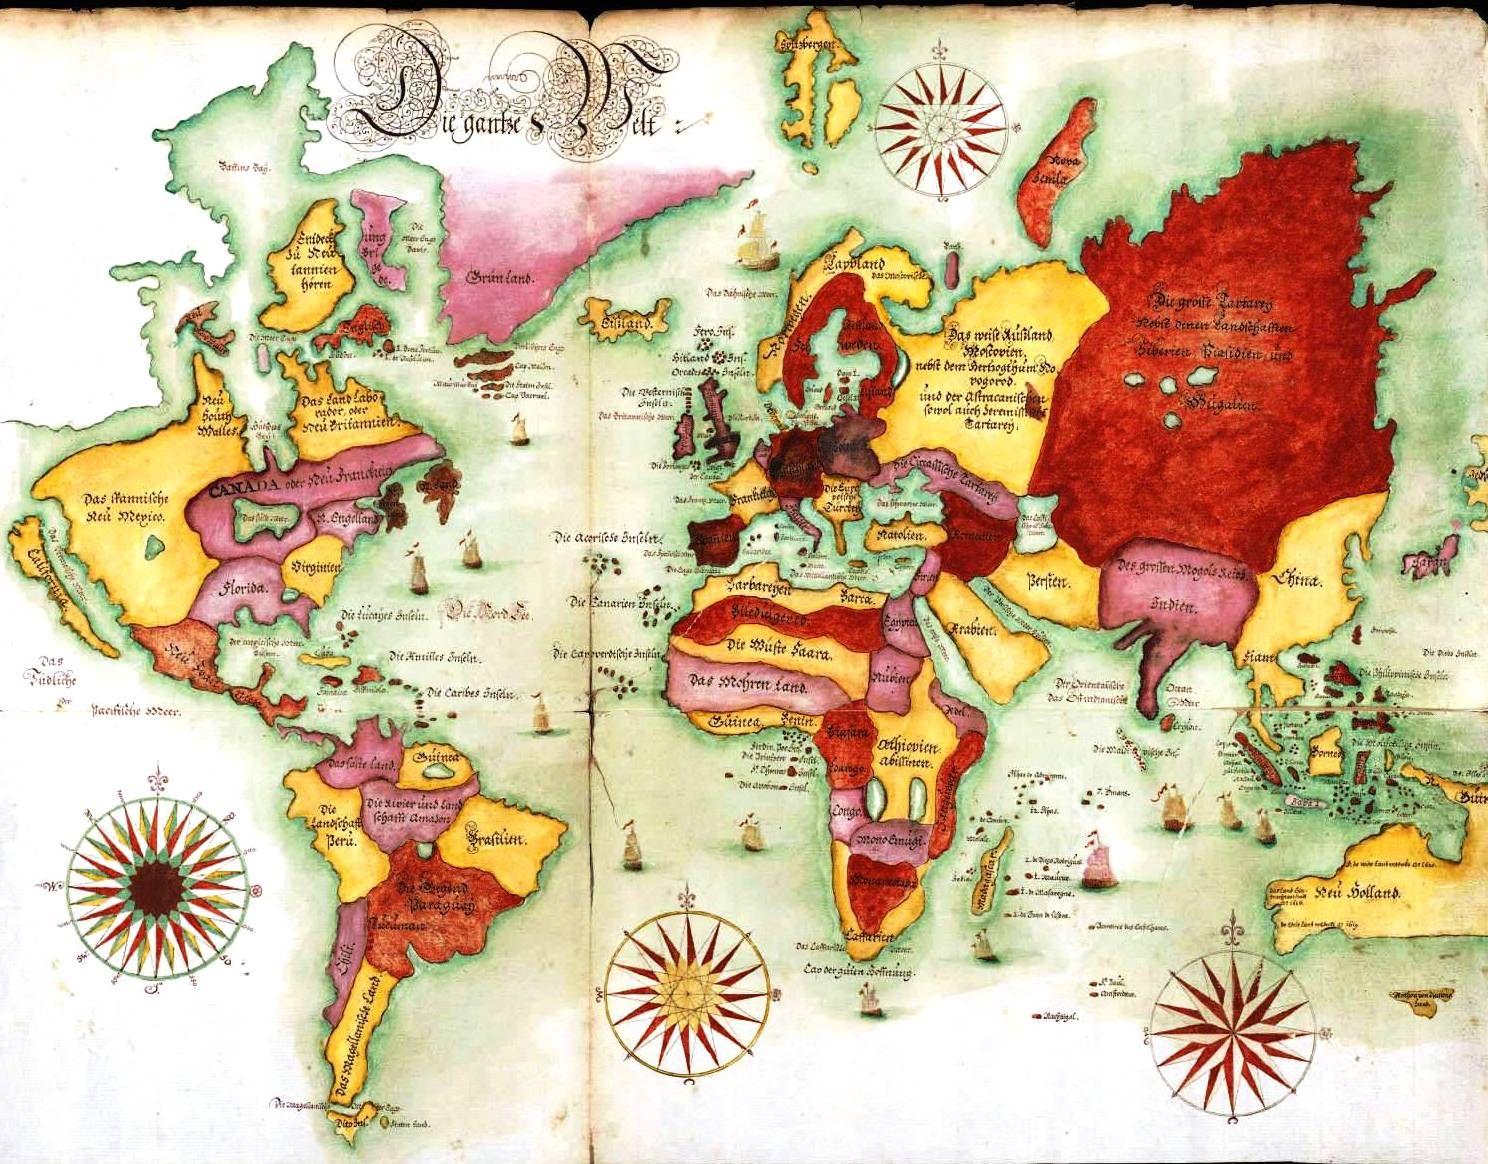 20 free vintage map printable images remodelaholic art 20 free vintage map printable images remodelaholic art printable maps gumiabroncs Image collections